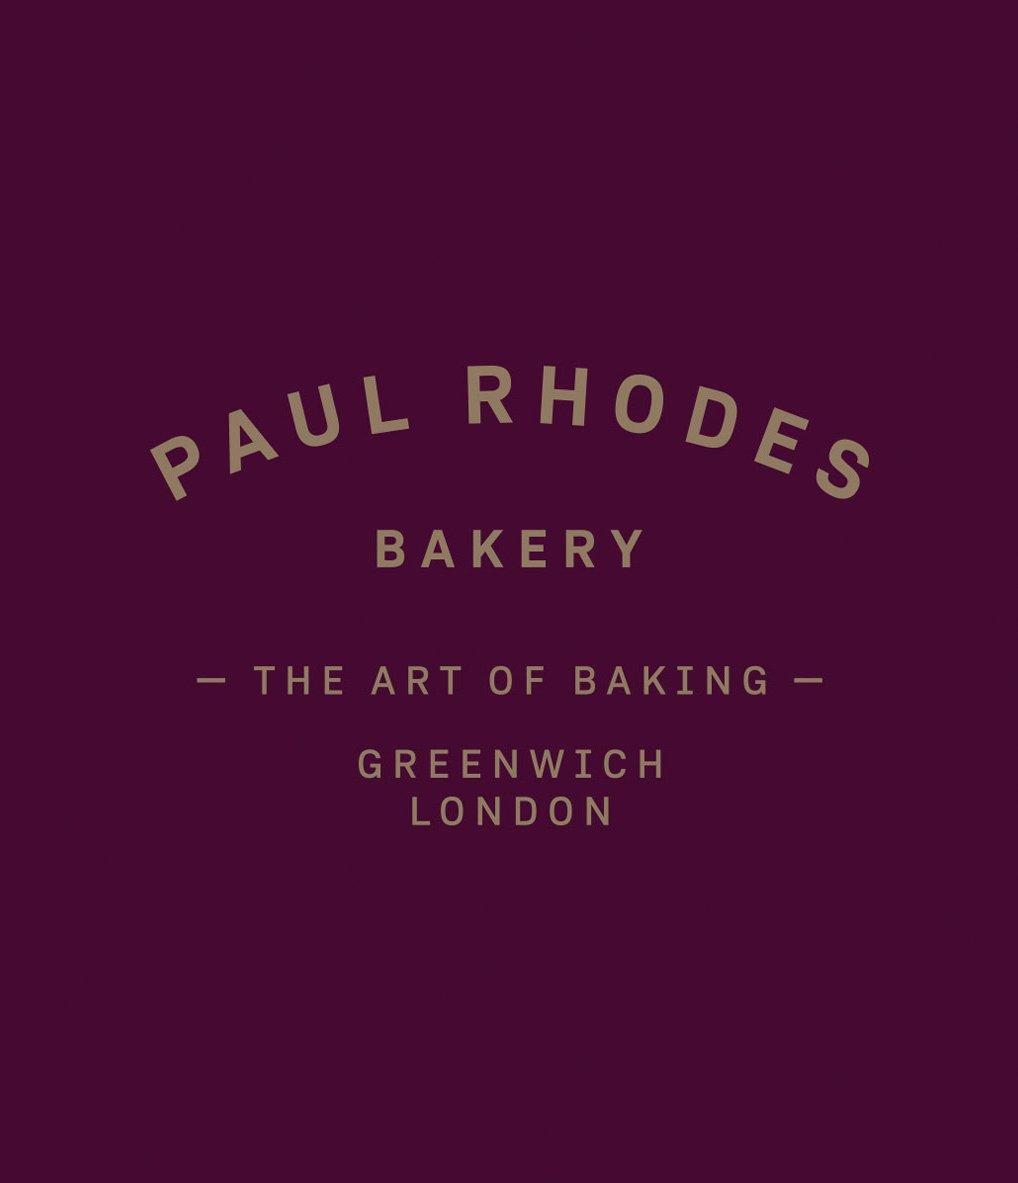 Paul Rhodes Bakery Branding by Spinach Branding Agency